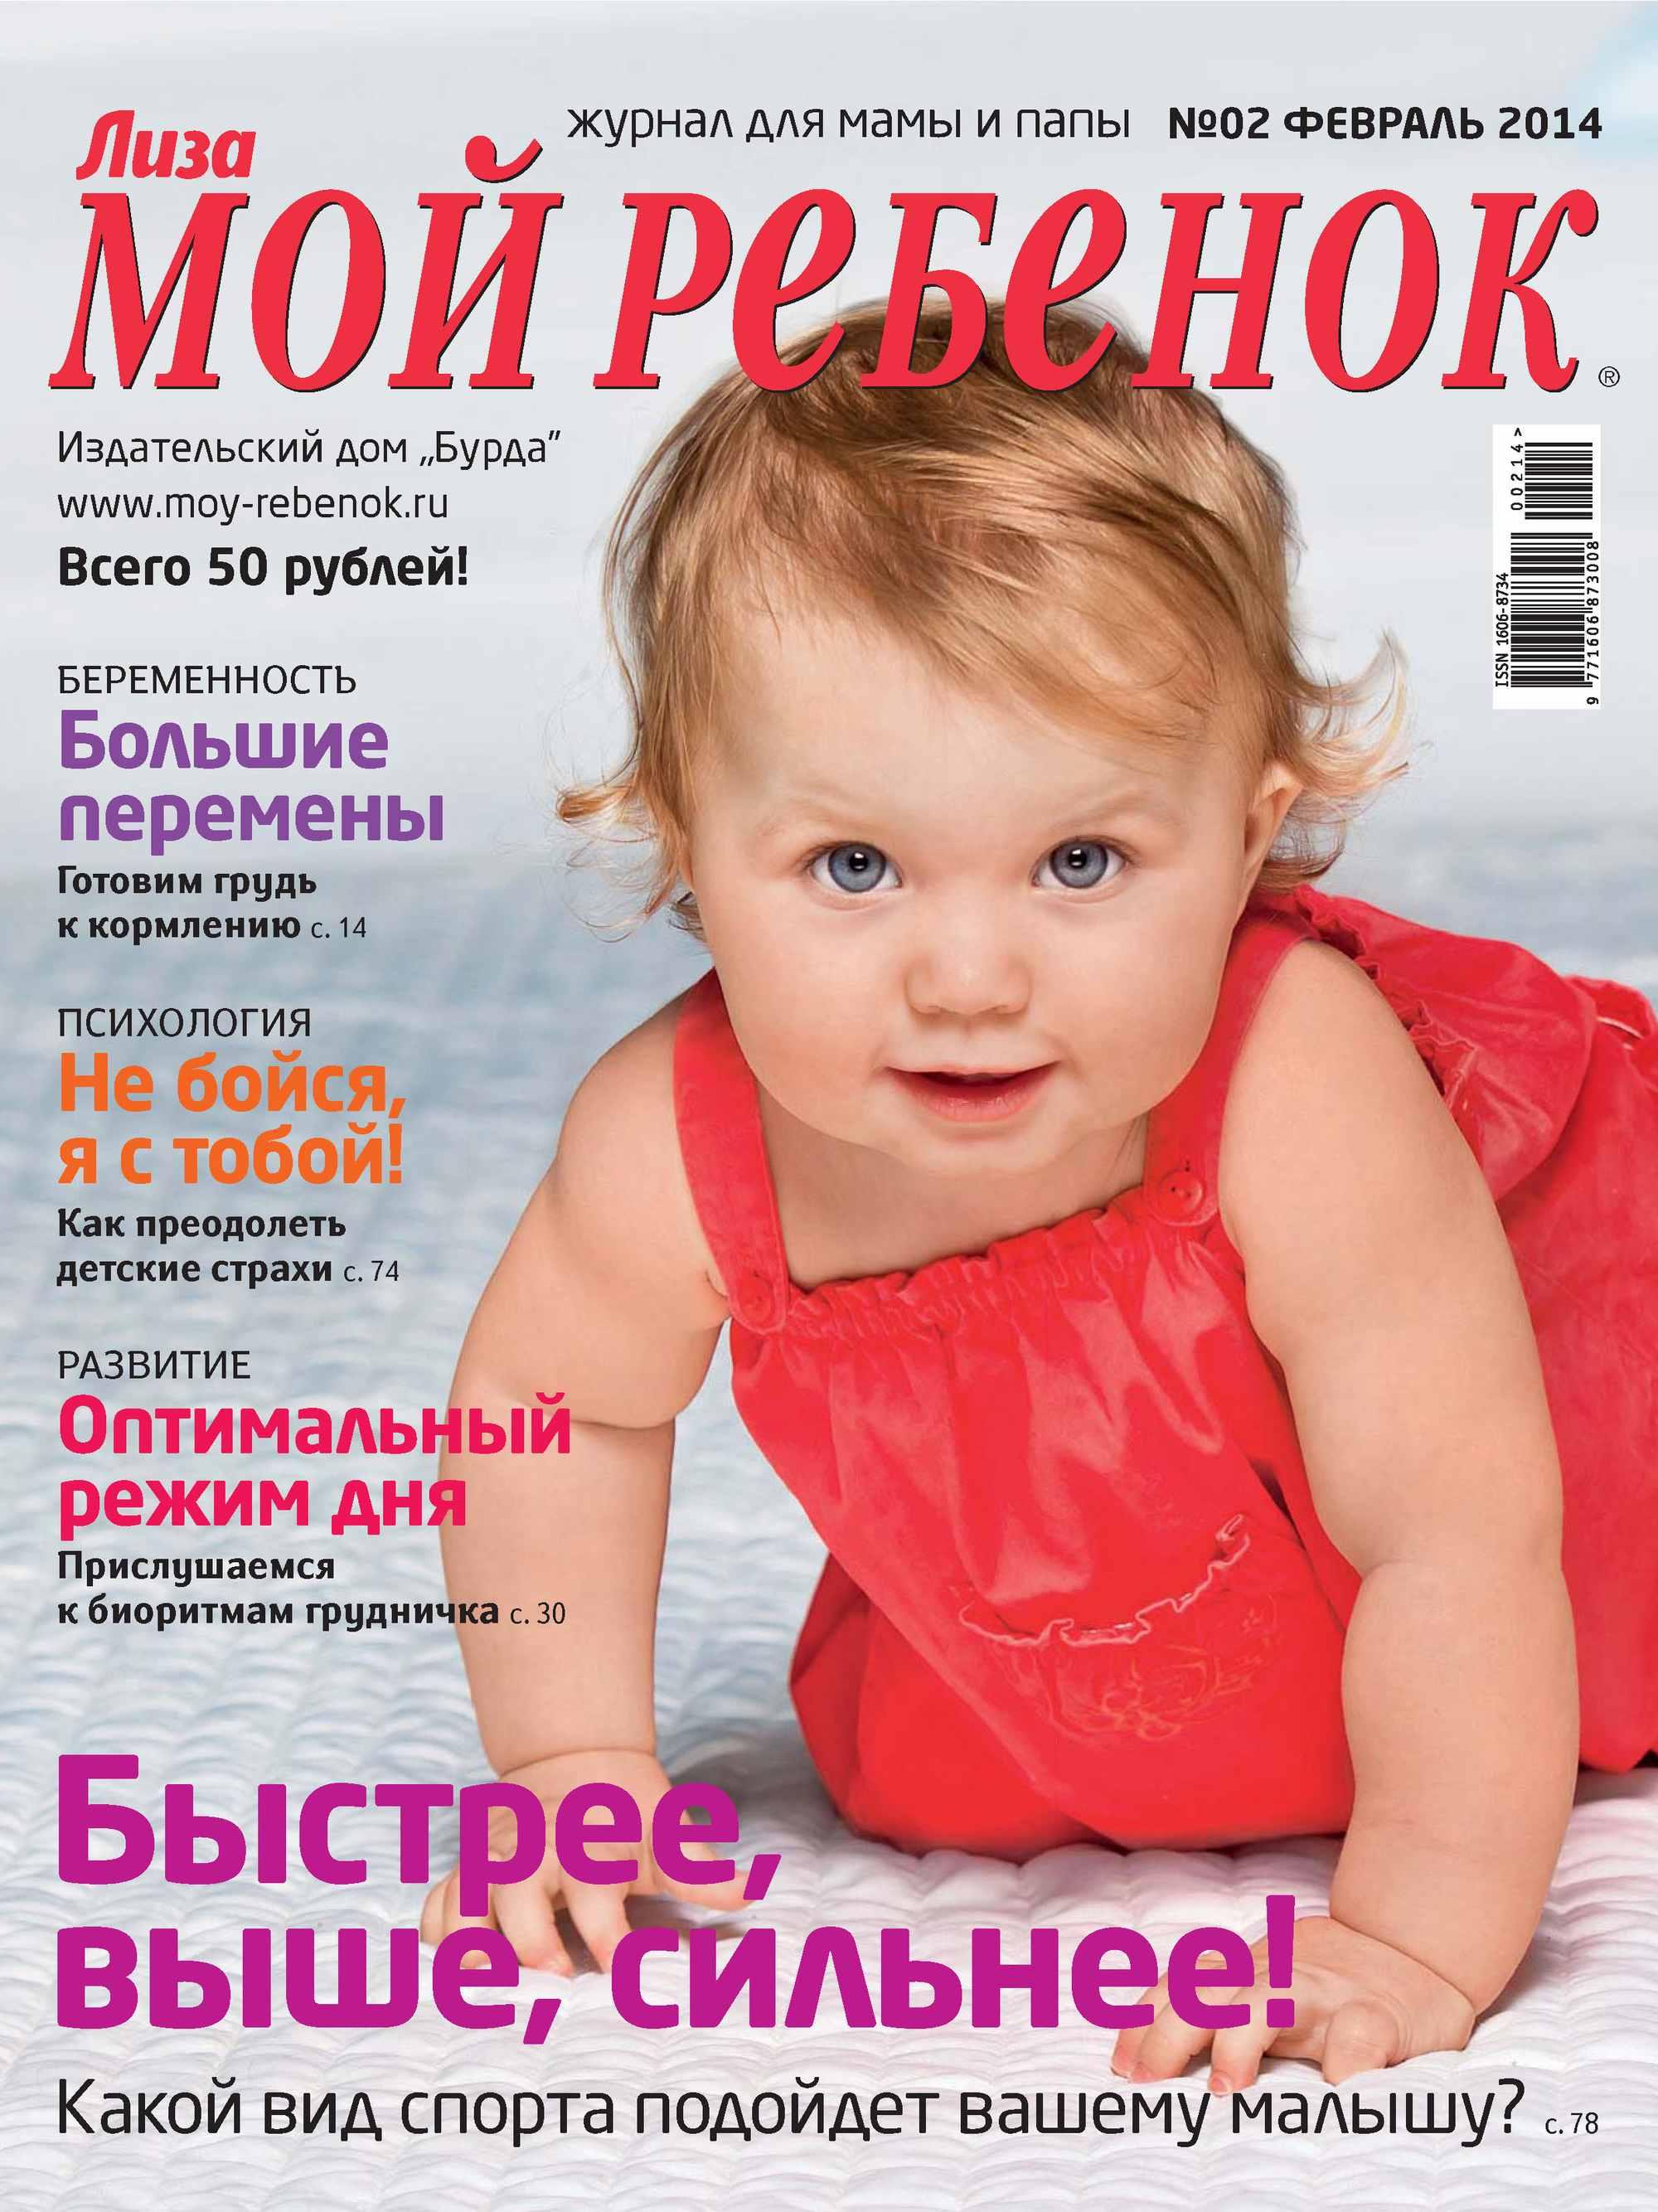 ИД «Бурда» Журнал «Лиза. Мой ребенок» №02/2014 ид бурда журнал лиза мой ребенок 11 2014